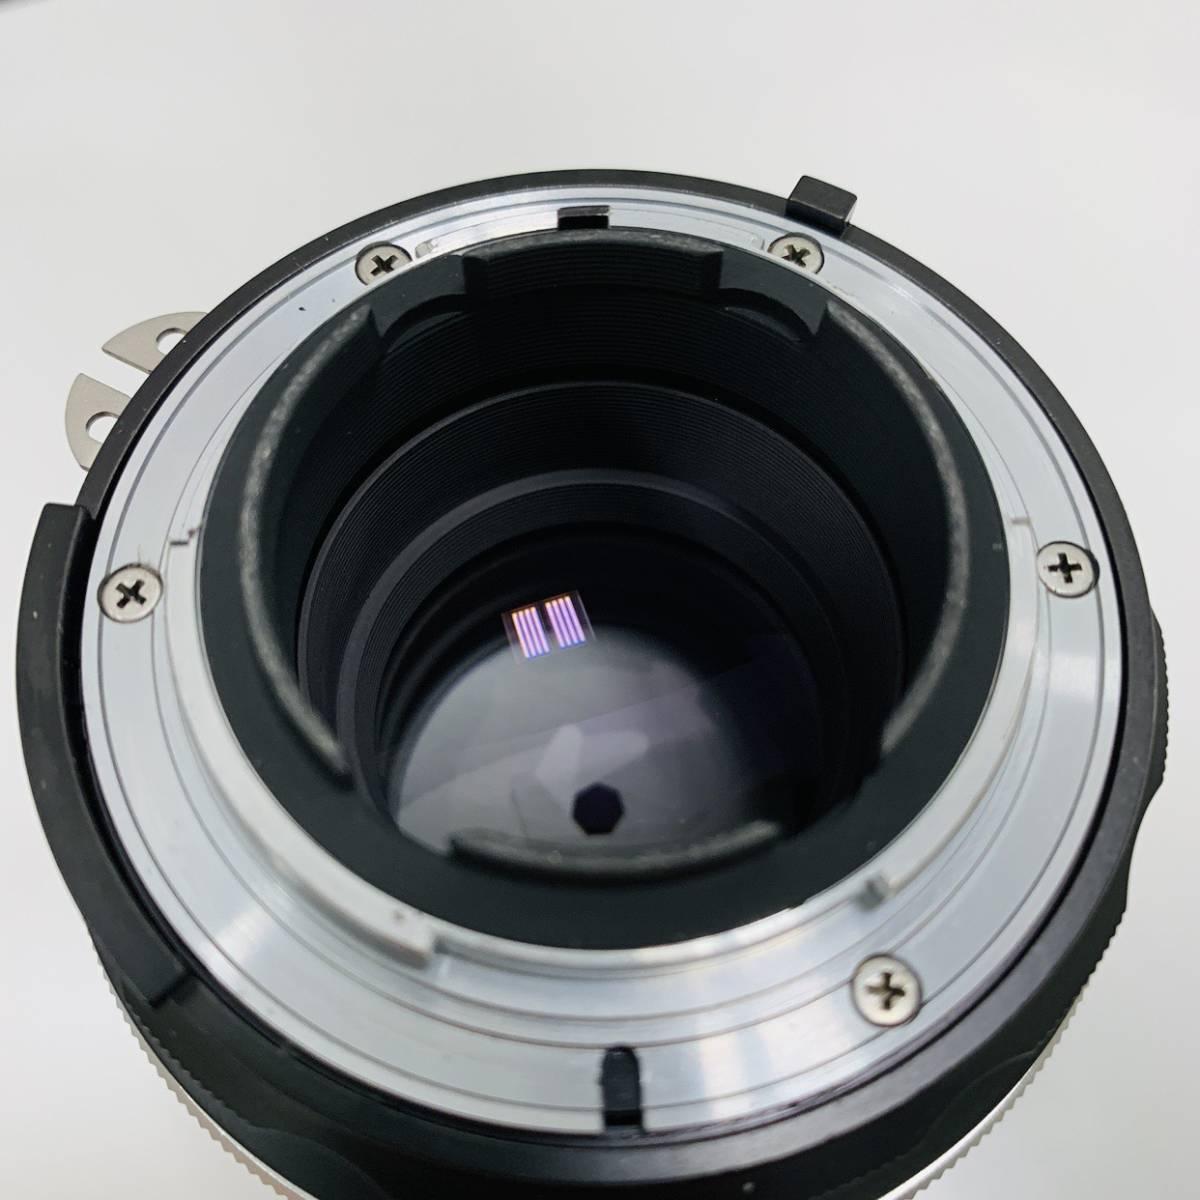 【2978】 Nikon  Nikon  NIKKOR-Q Auto 1:2.8 f=135mm  камера   оптика   135mm 1 однообъективнай зеркальный   чехол  прилагается ...